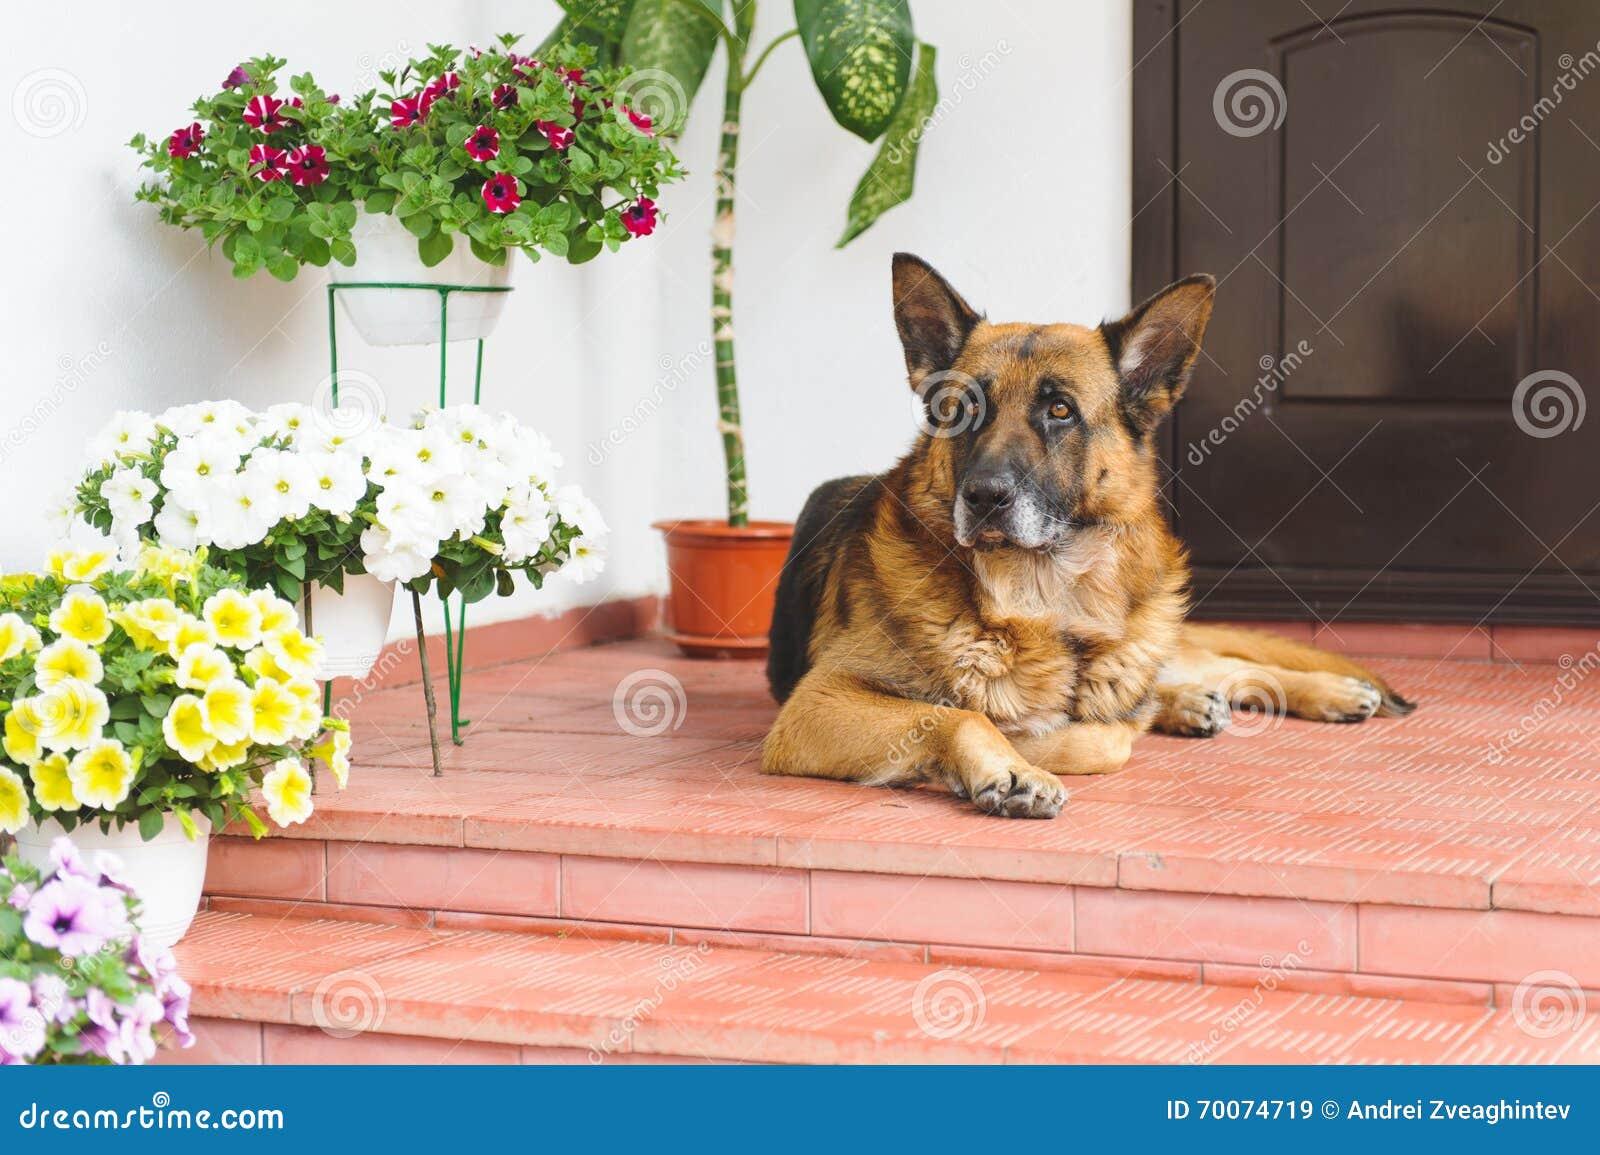 Sheep Dog on Porch